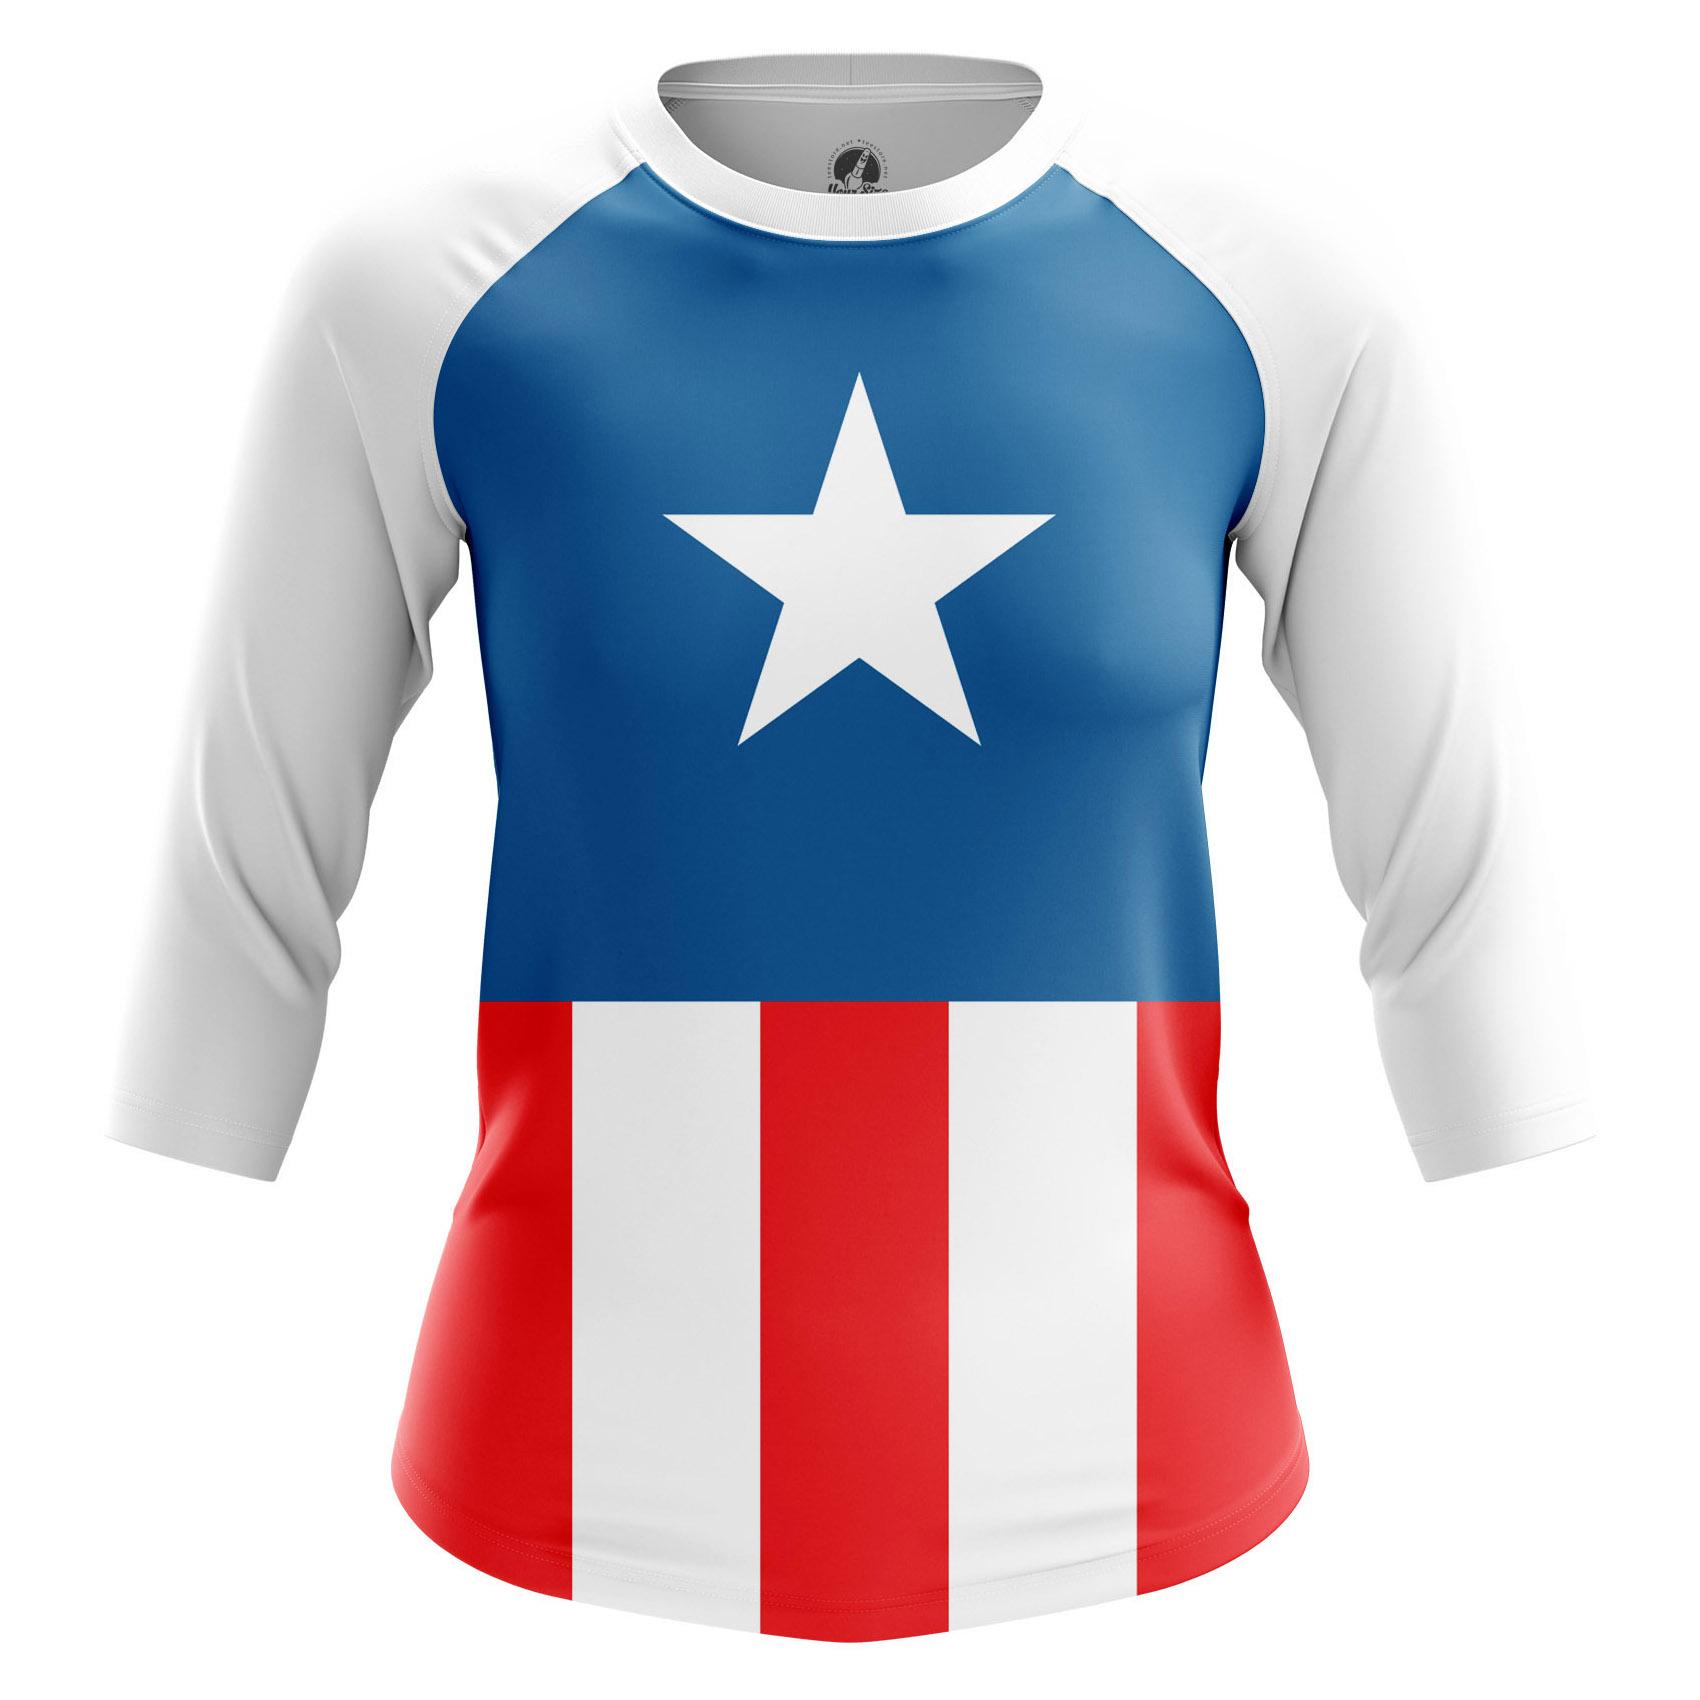 Merch Women'S T-Shirt Cap Suit America